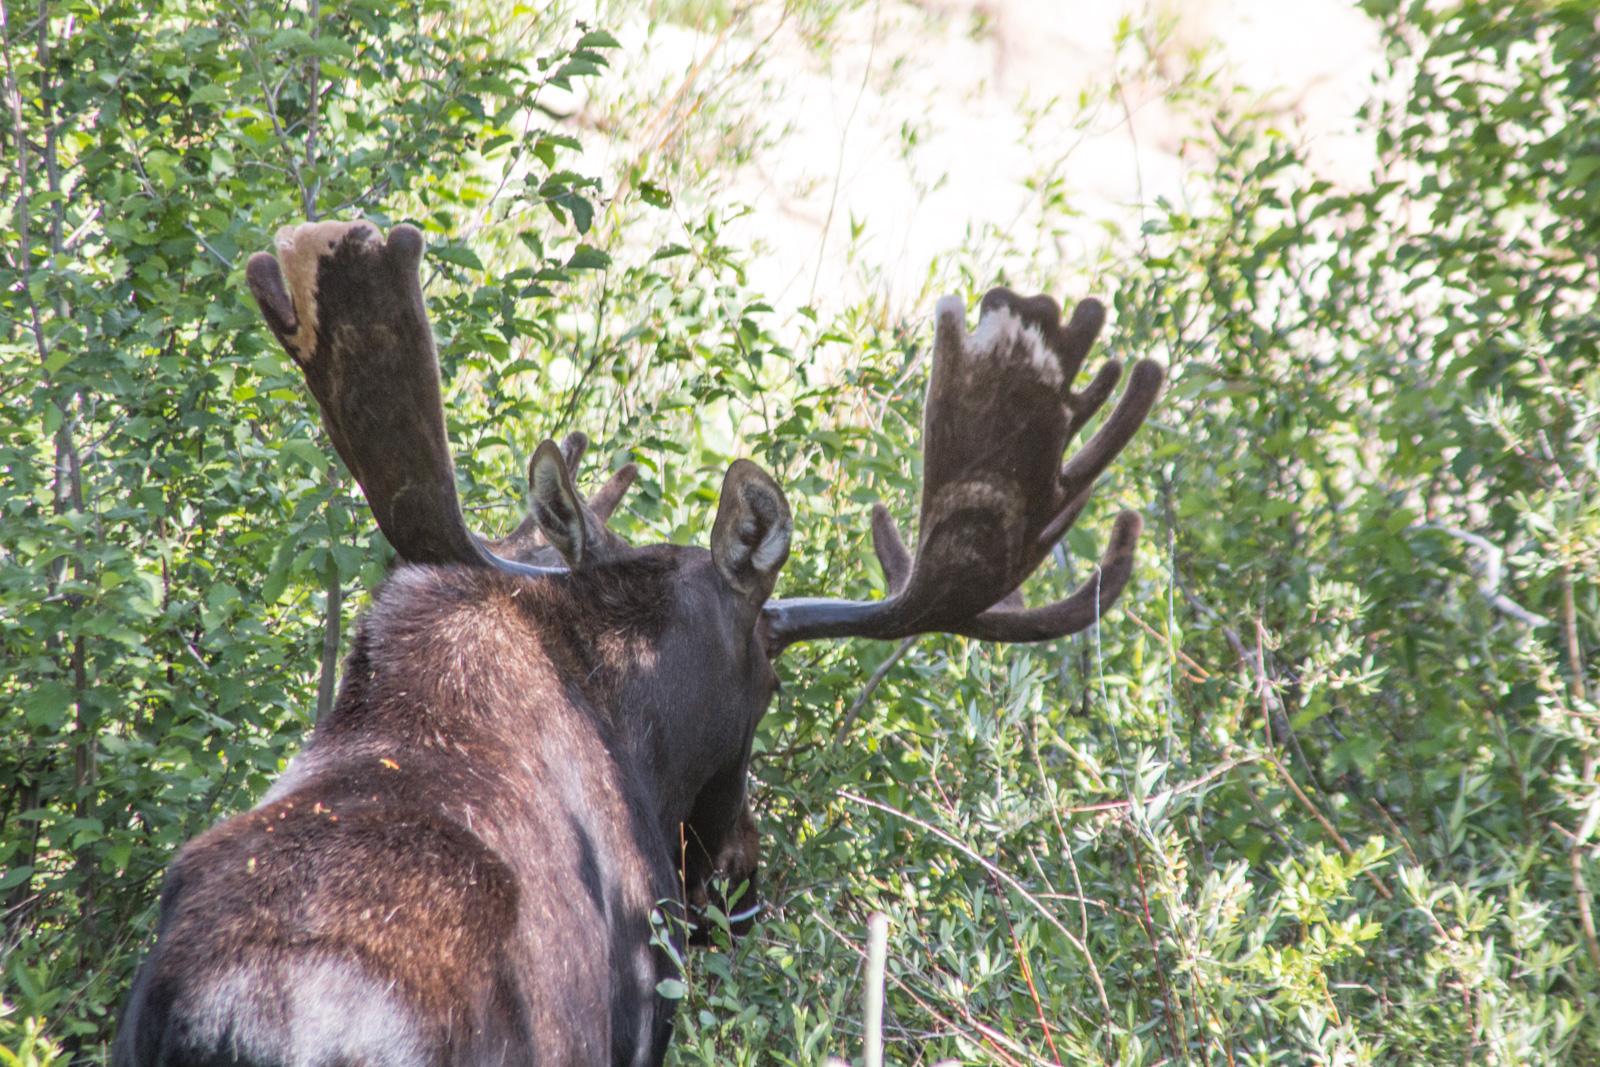 RMNP Bull Moose – Amazing Patterns on His Antlers